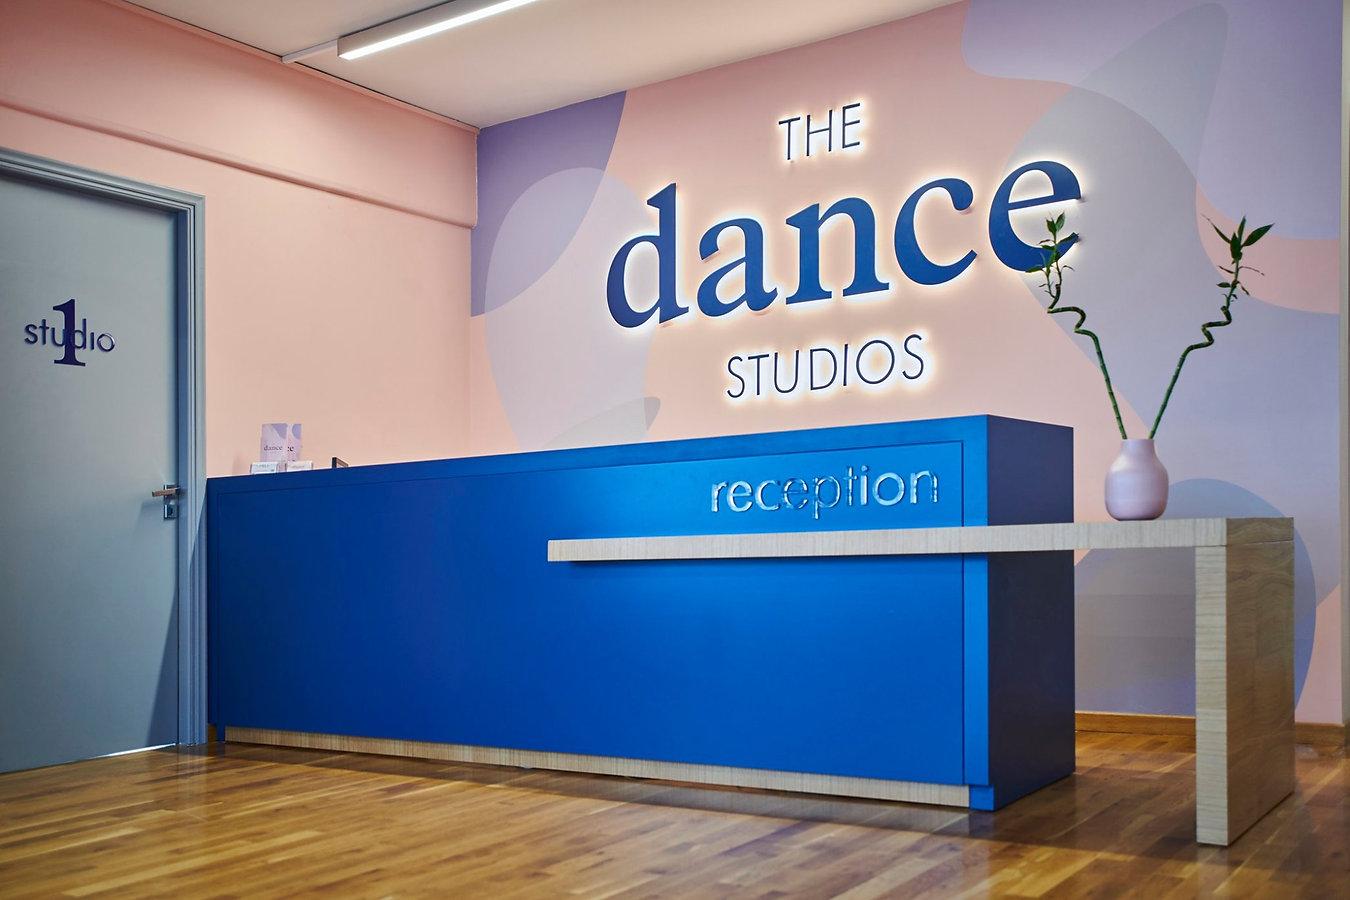 Pluto The dance studios 4.jpg